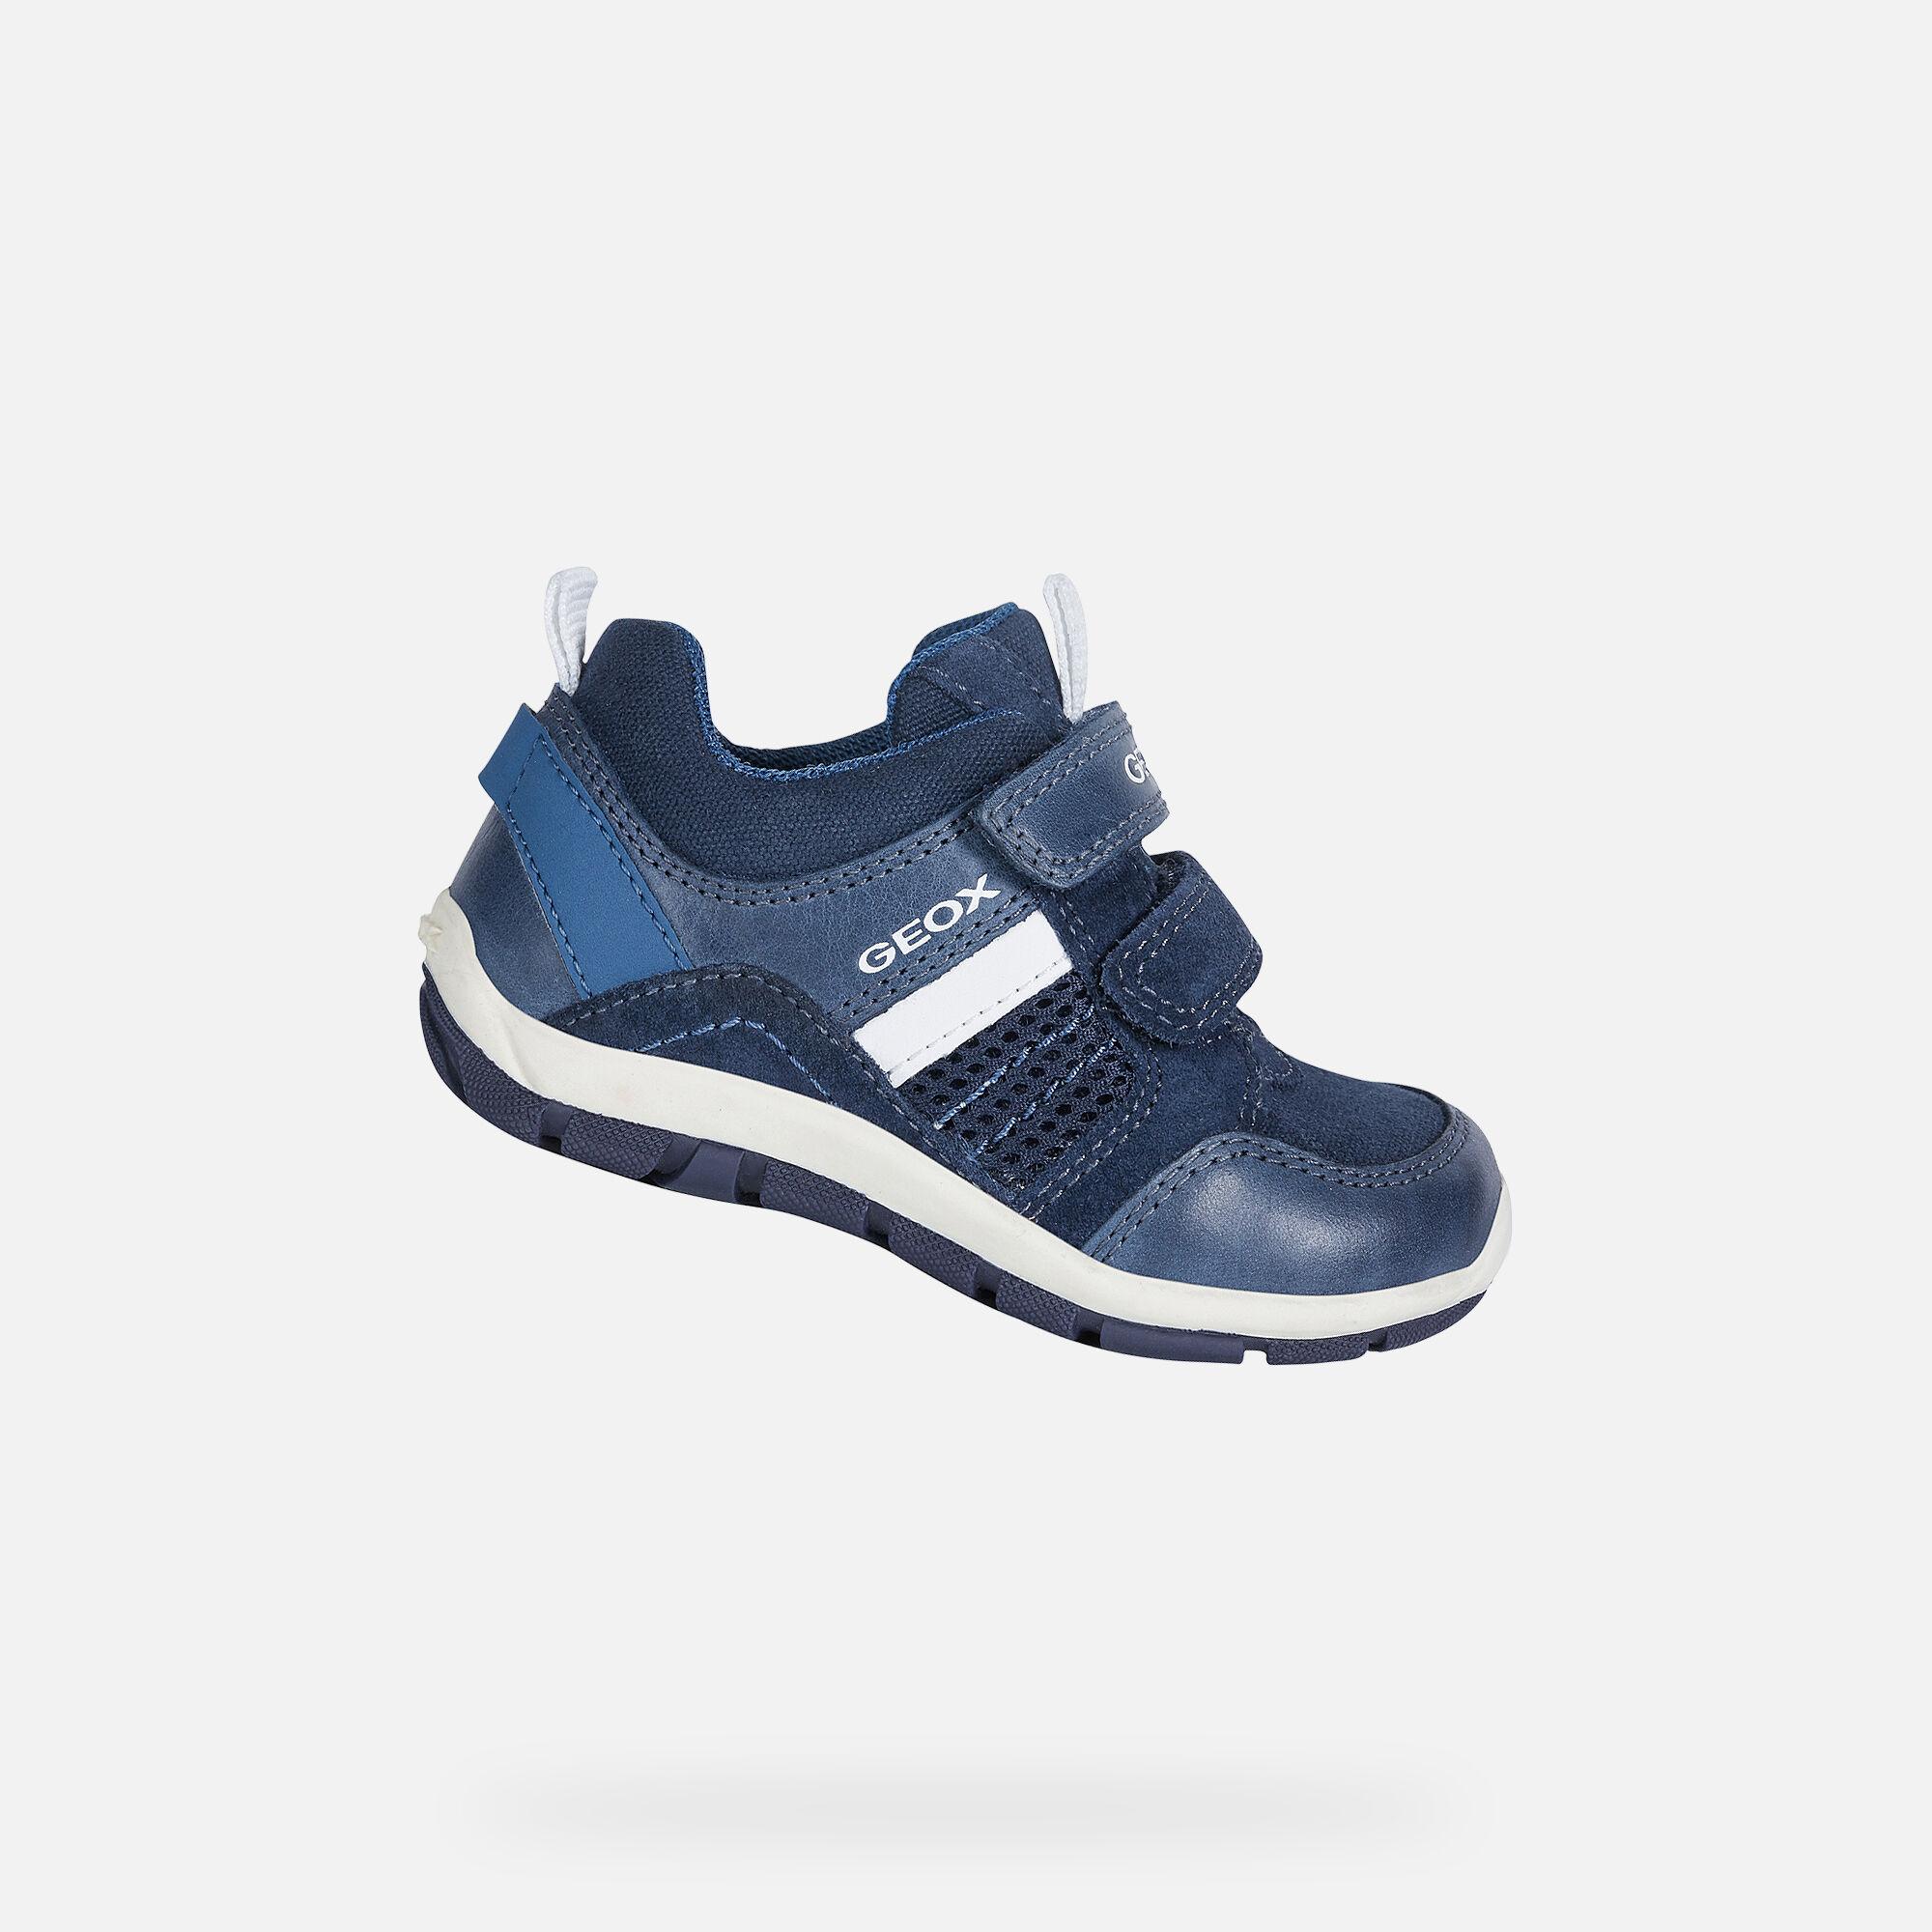 Geox SHAAX Baby Boy: Navy blue Sneakers